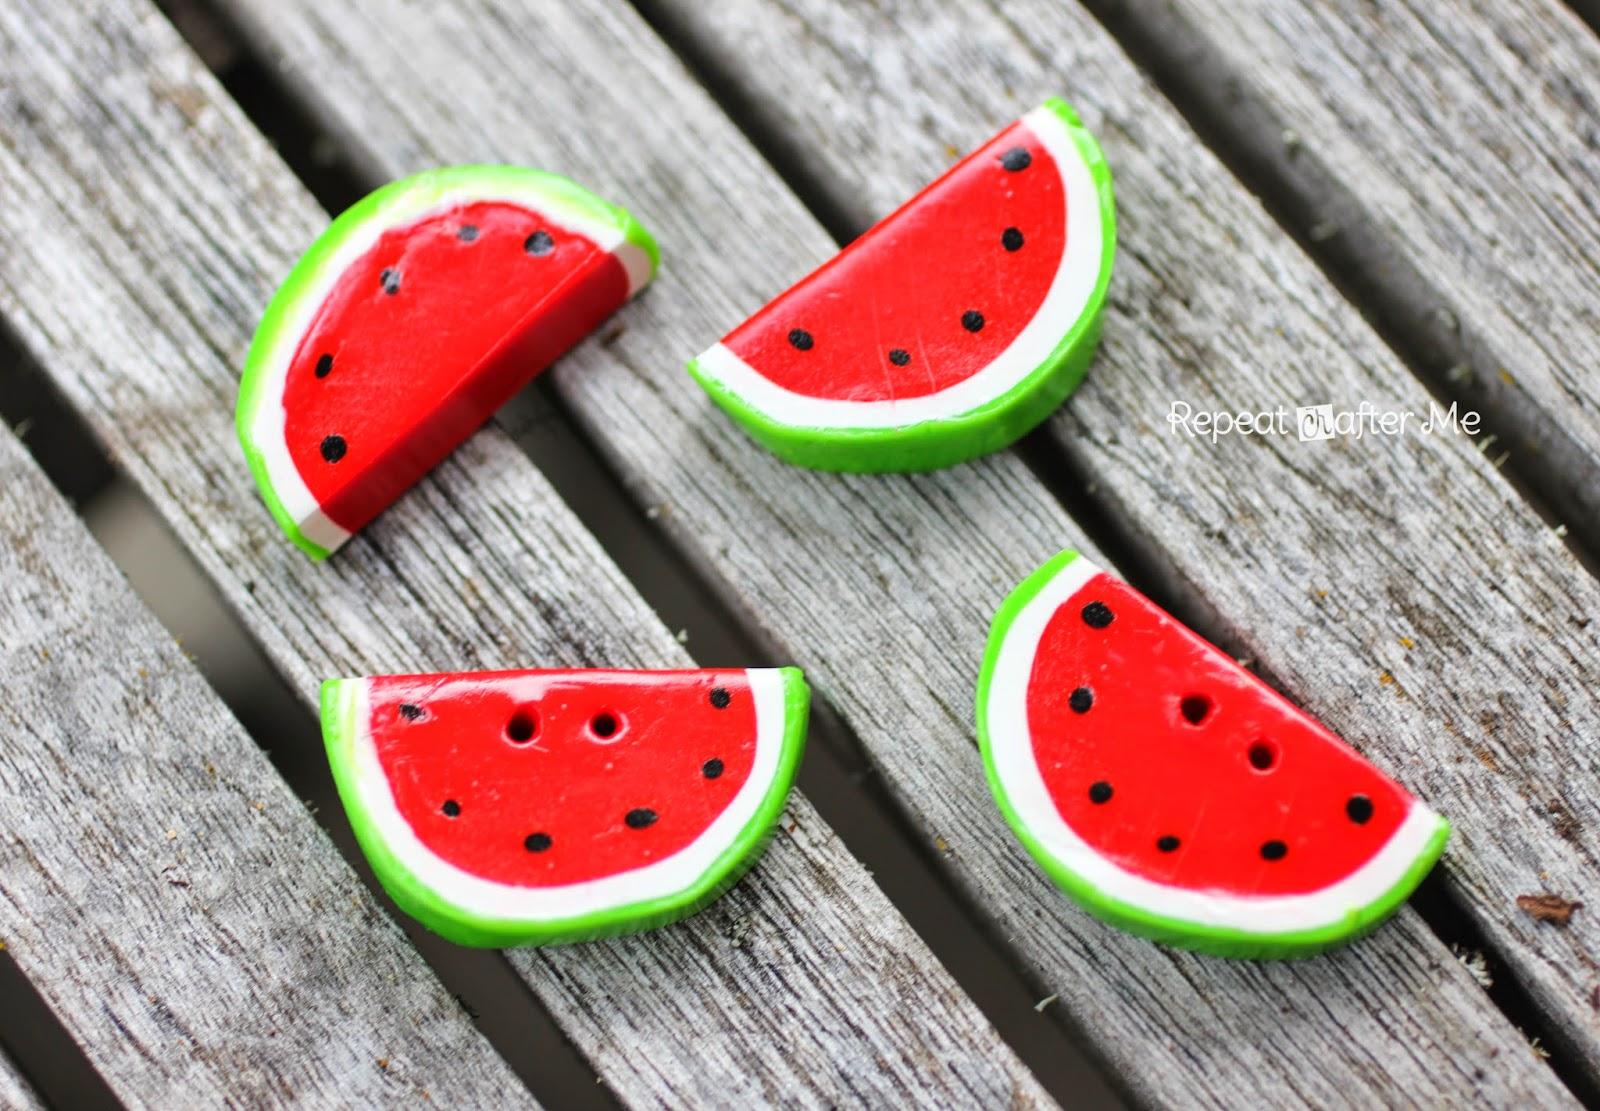 http://4.bp.blogspot.com/-8mJyHP4uwjk/U3aZLo-qLhI/AAAAAAAAJAI/BA8ZPu9Oevw/s1600/Watermelon1.jpg